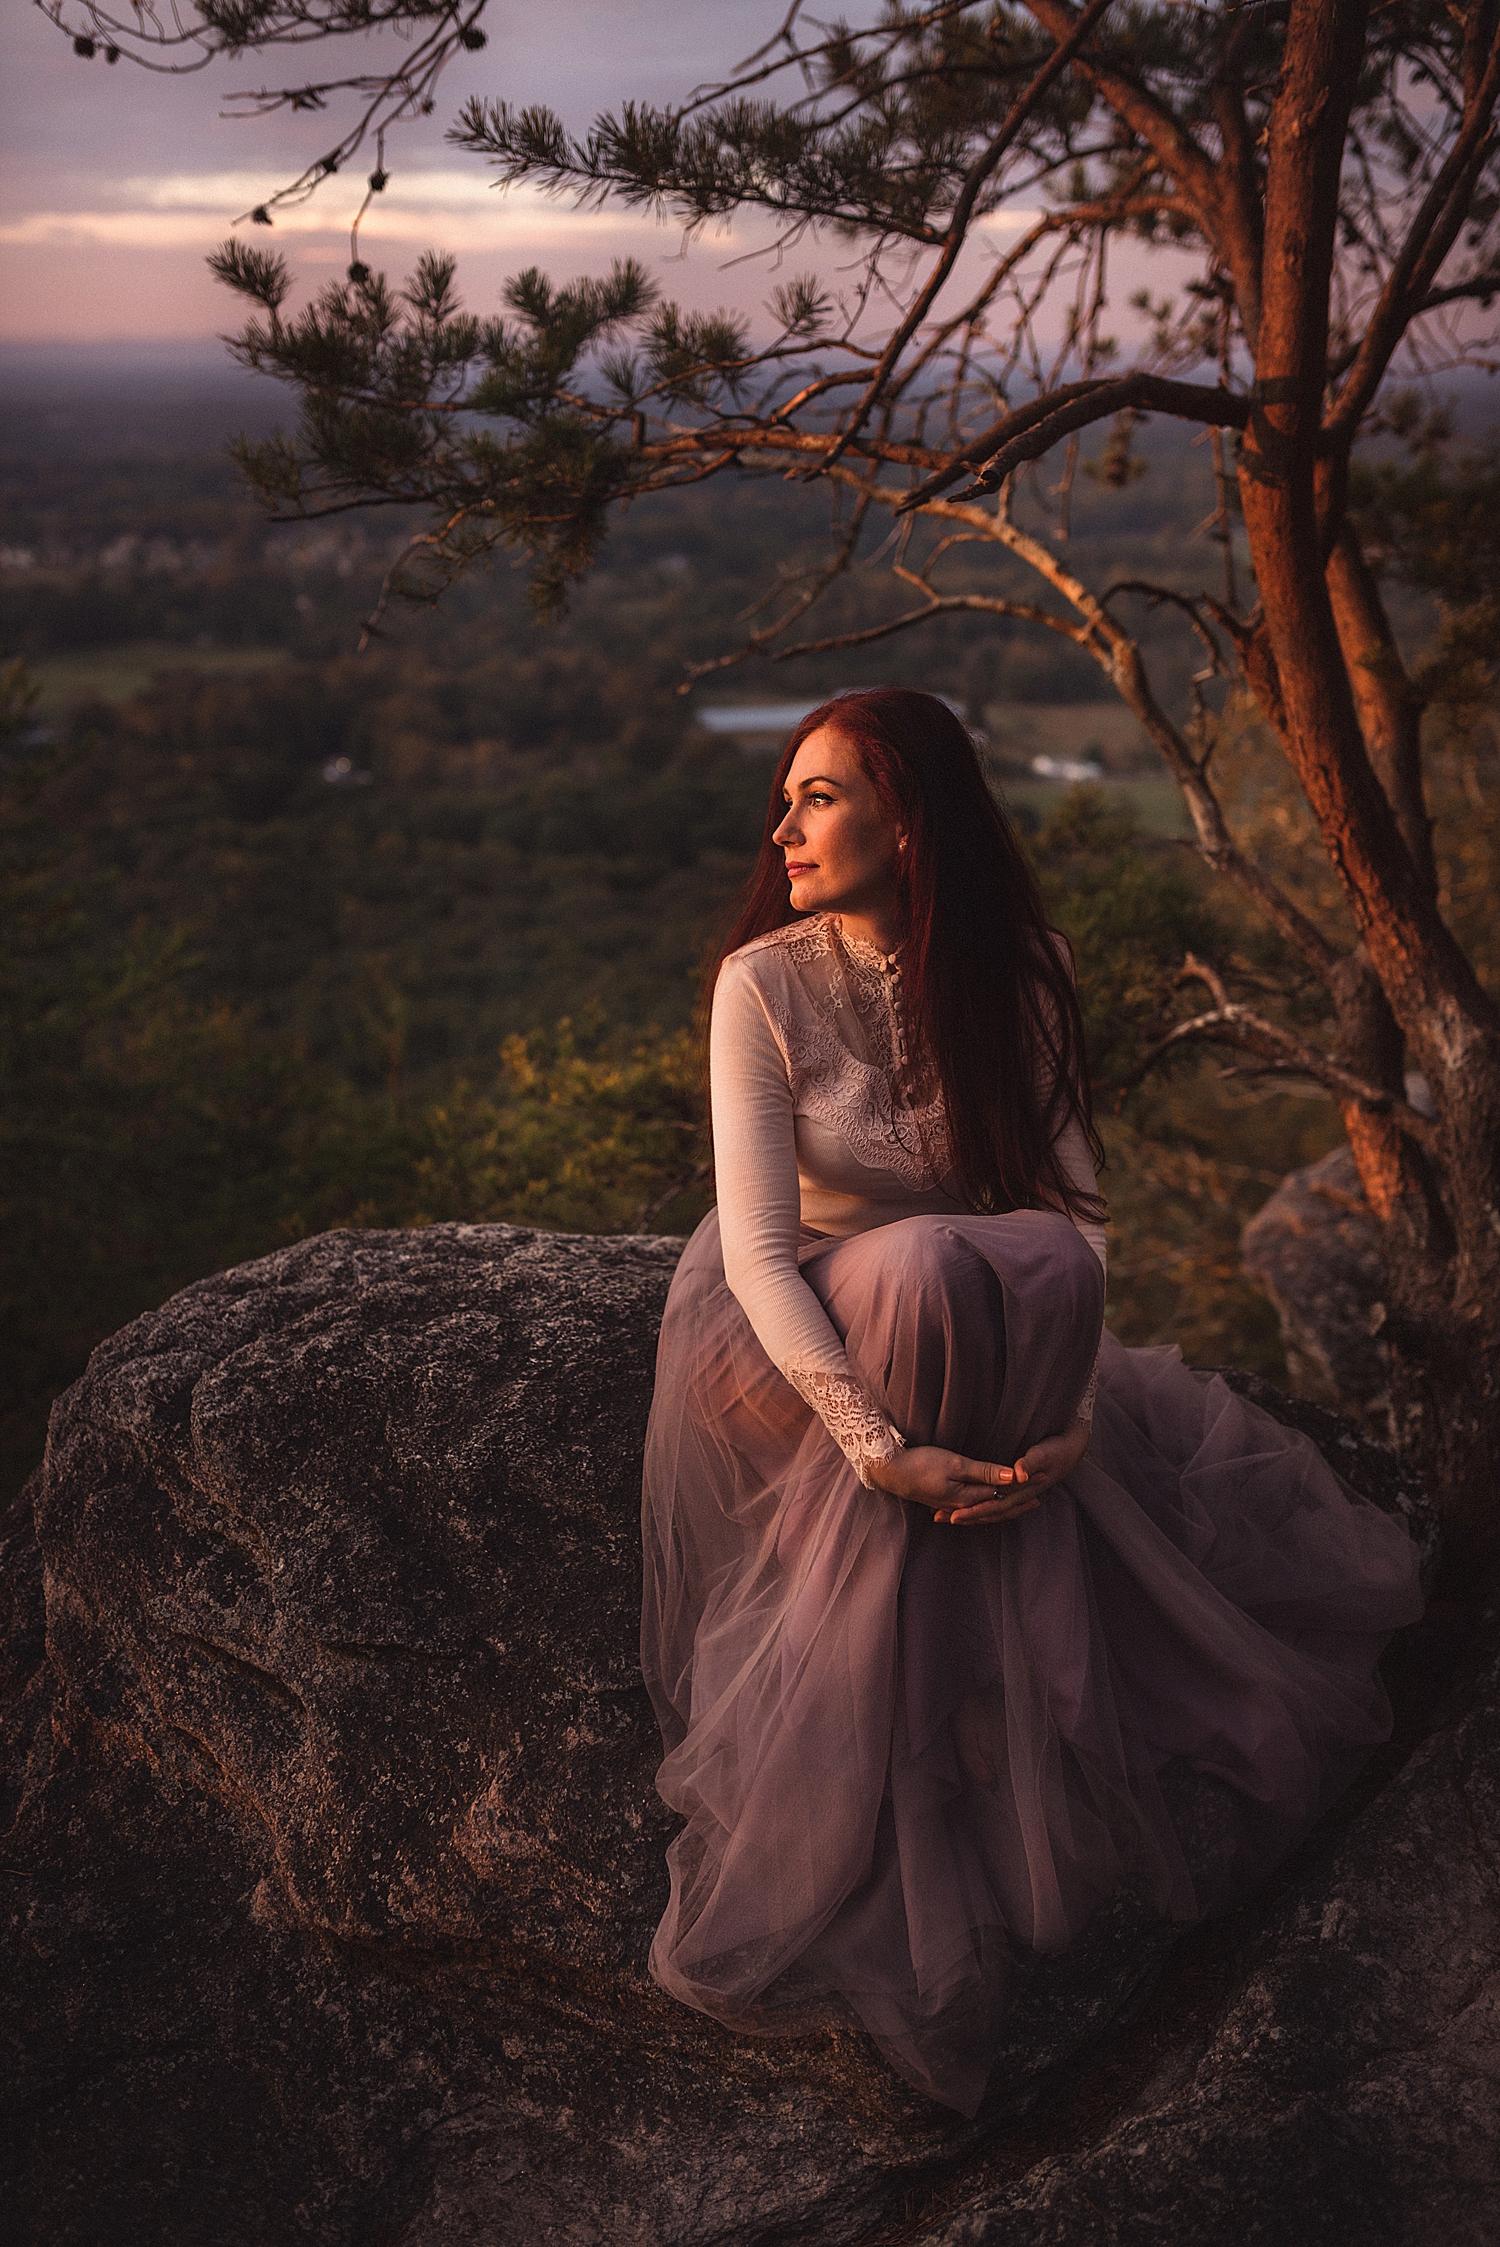 atlanta-maternity-photography-katyavilchyk-tanya_0134.jpg